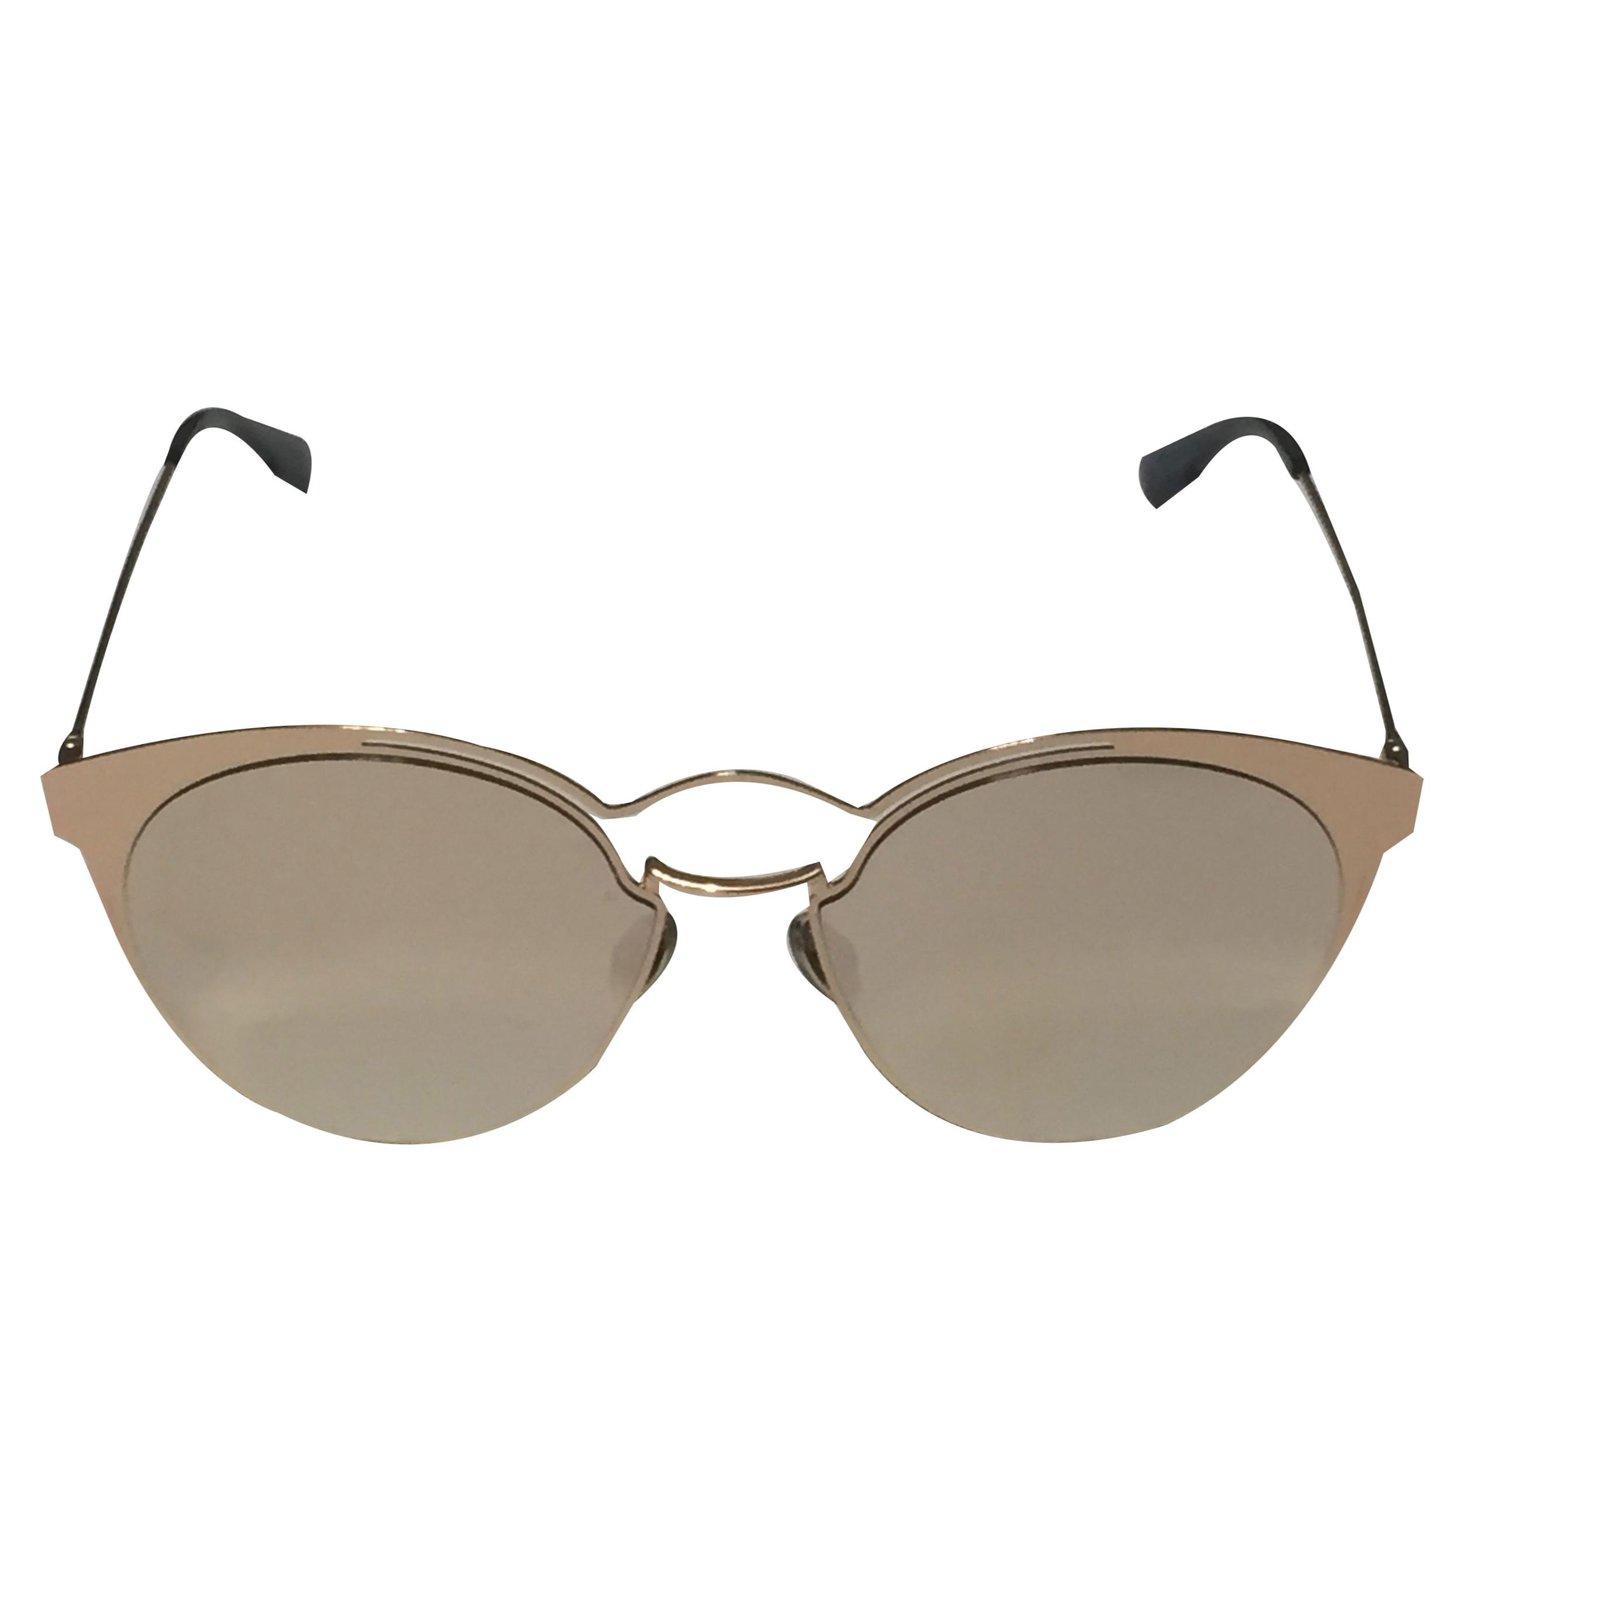 3b35737d6e4 Christian Dior Sunglasses Sunglasses Metal Pink ref.84558 - Joli Closet